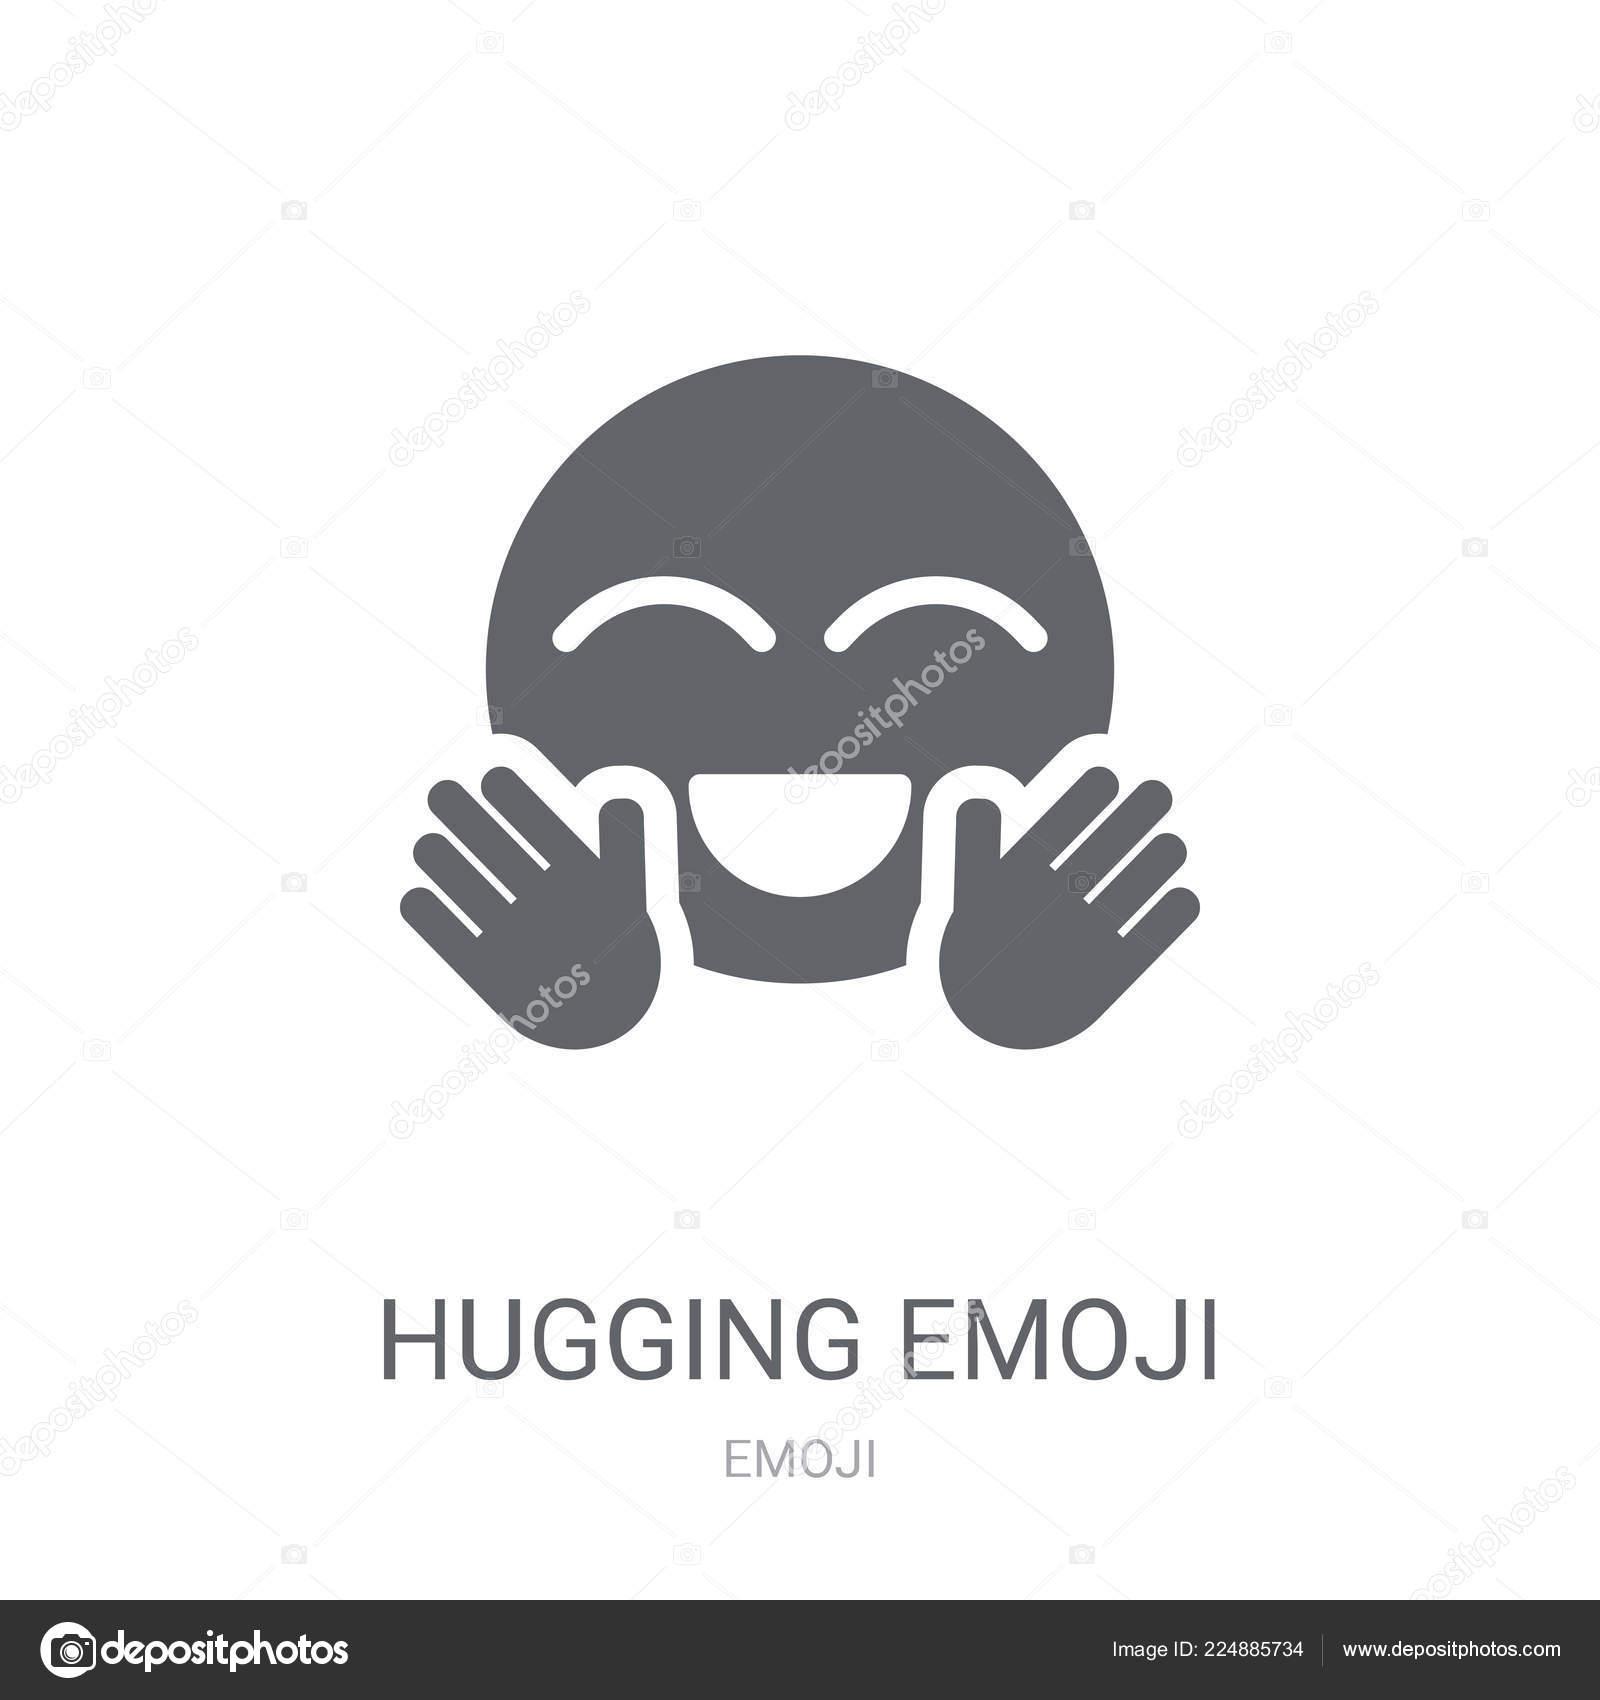 Hugging Emoji Icon Trendy Hugging Emoji Logo Concept White